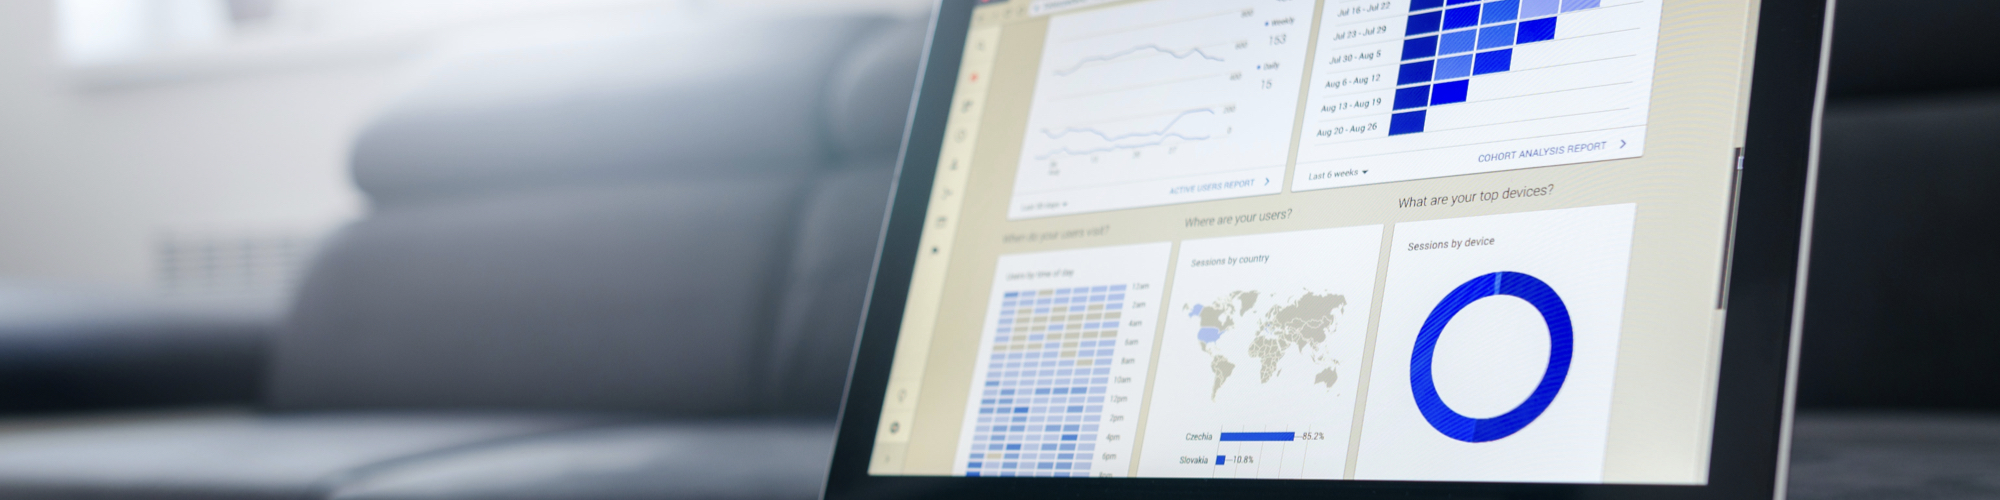 HubSpot CRM Report 분석하기